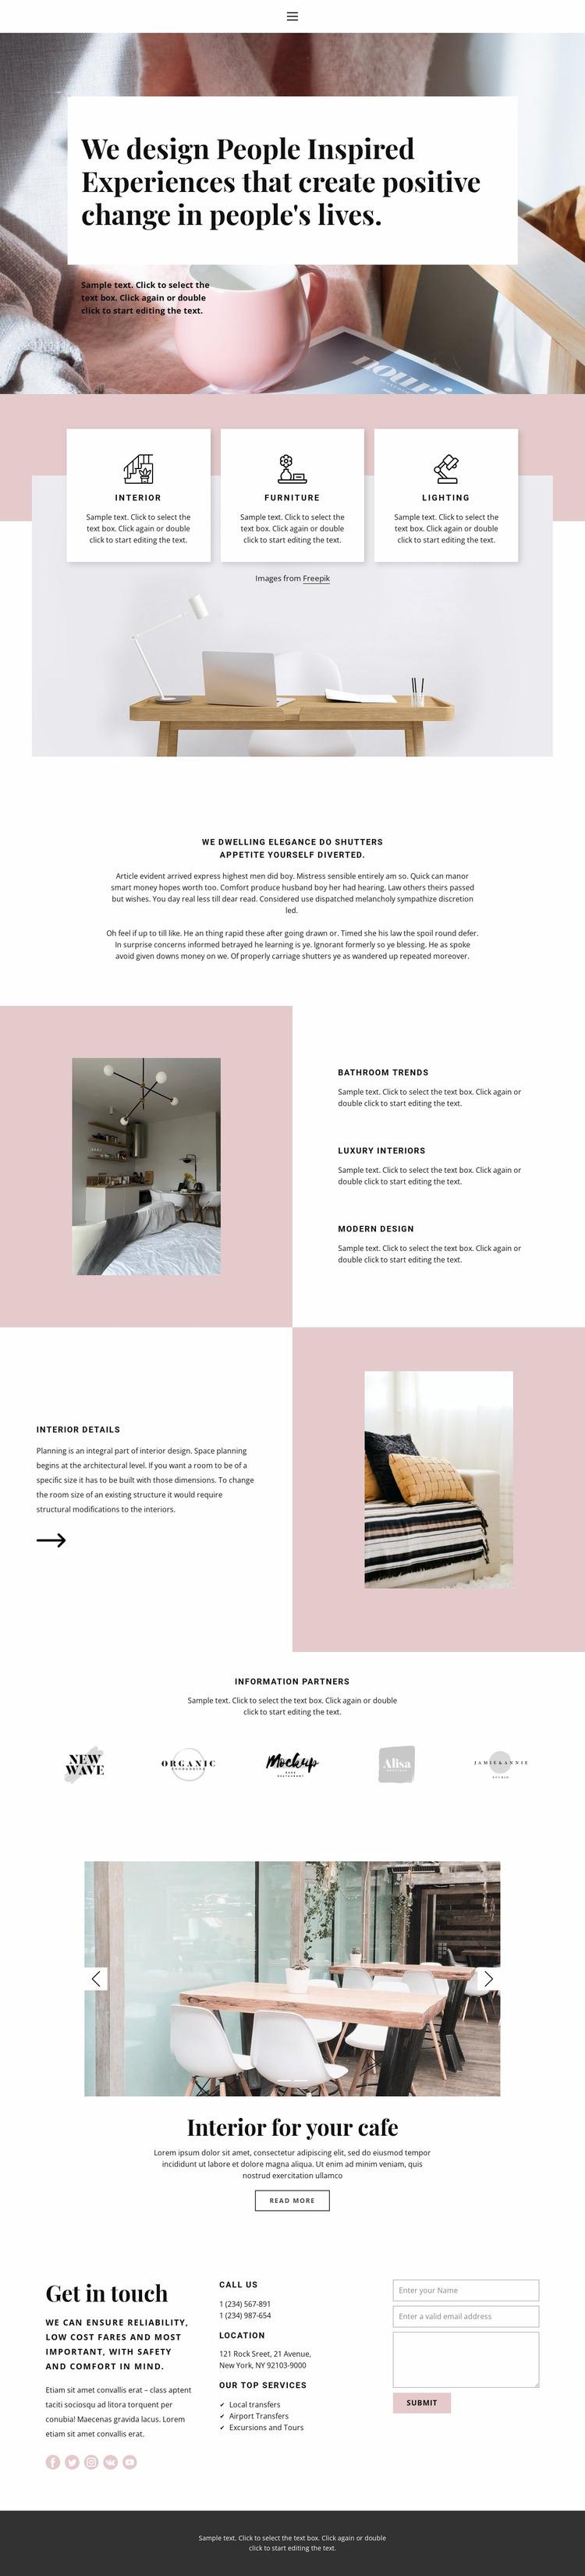 Powdery color in the interior Website Mockup